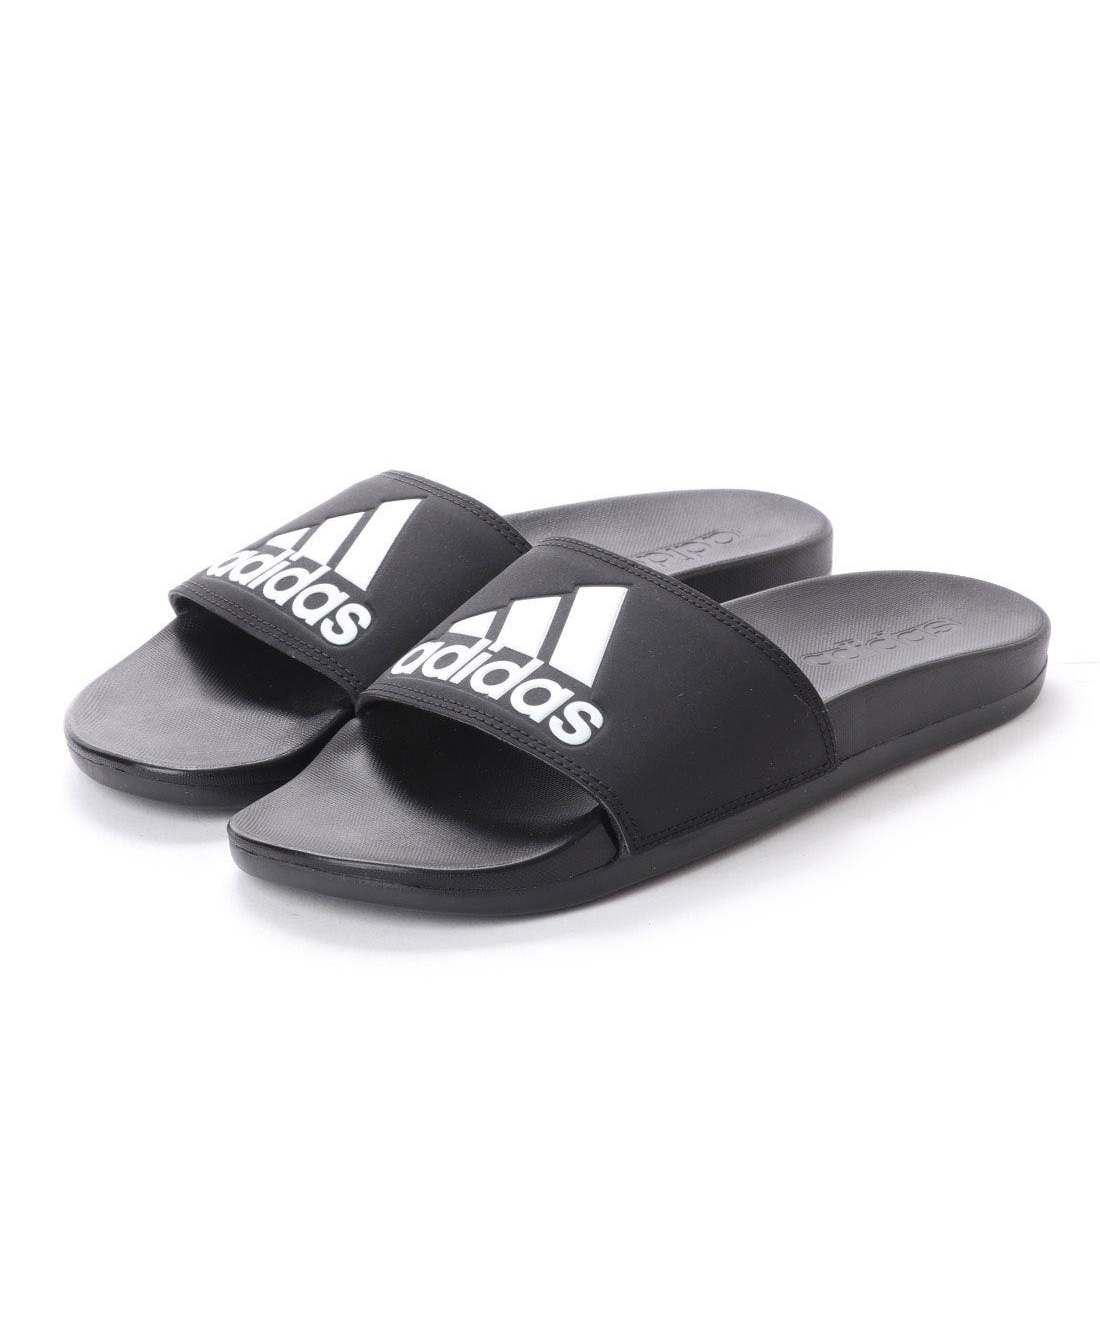 Logo Adidas Adilette CF Slides Sports Sandals Slippers Flip-Flops CG3425